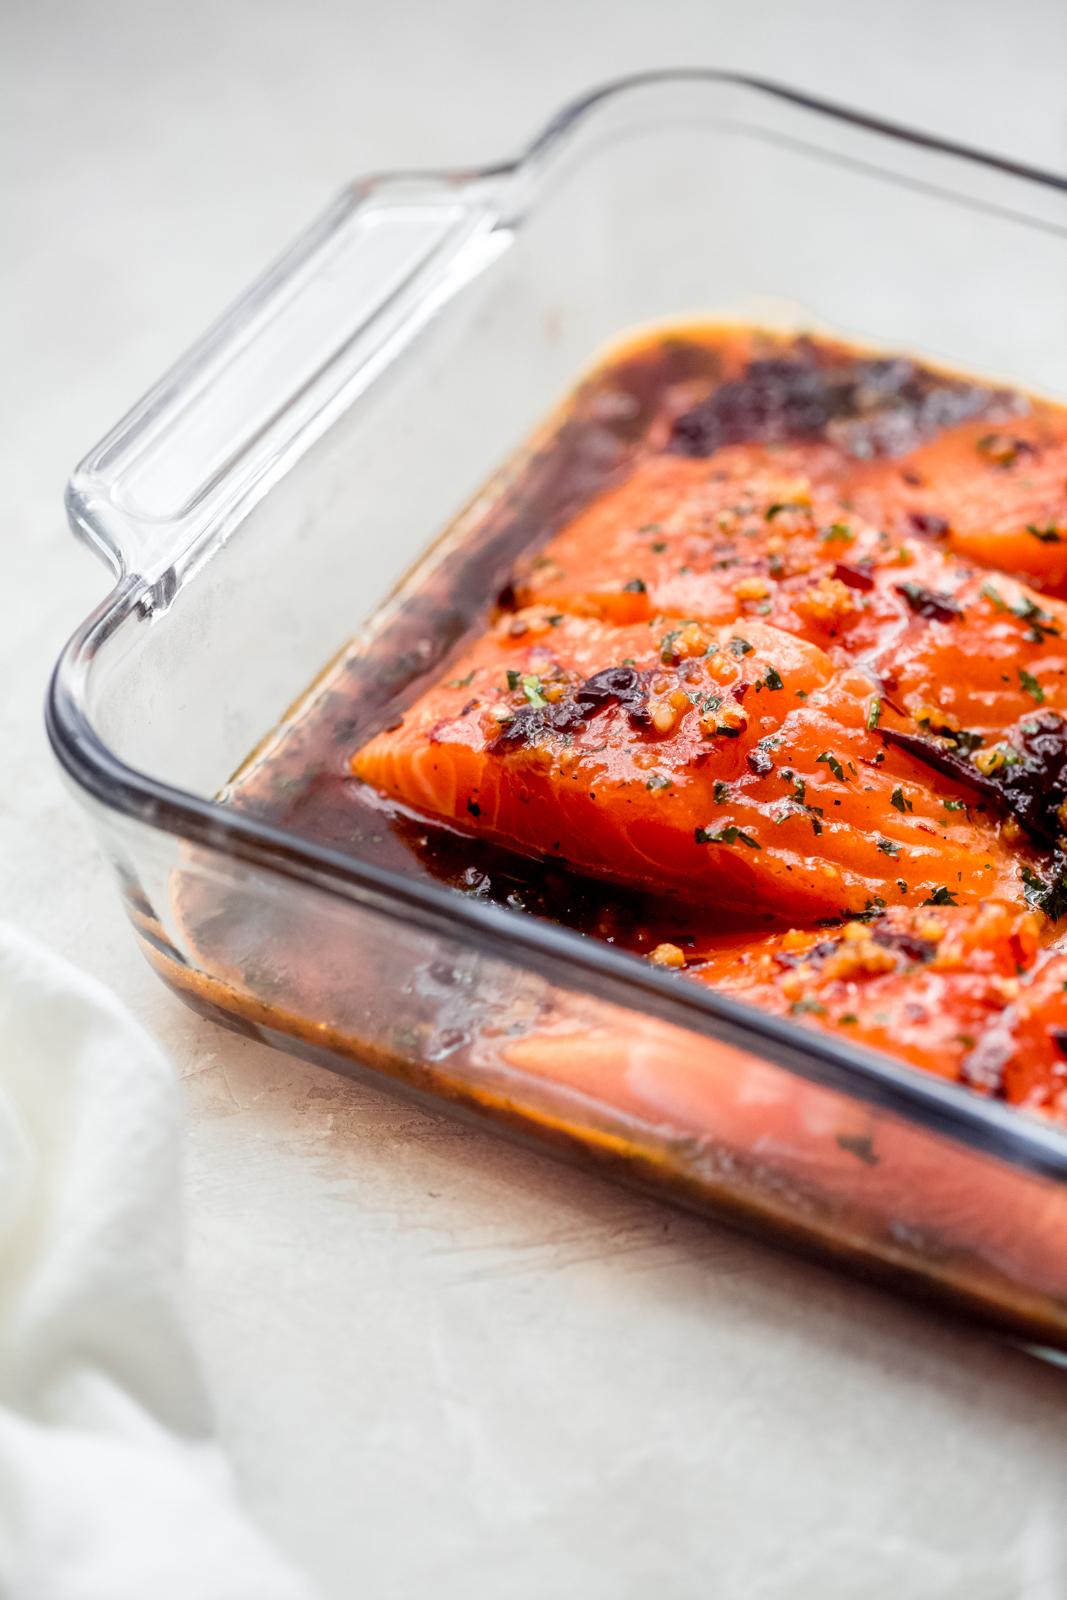 salmon filets marinating in glass baking dish